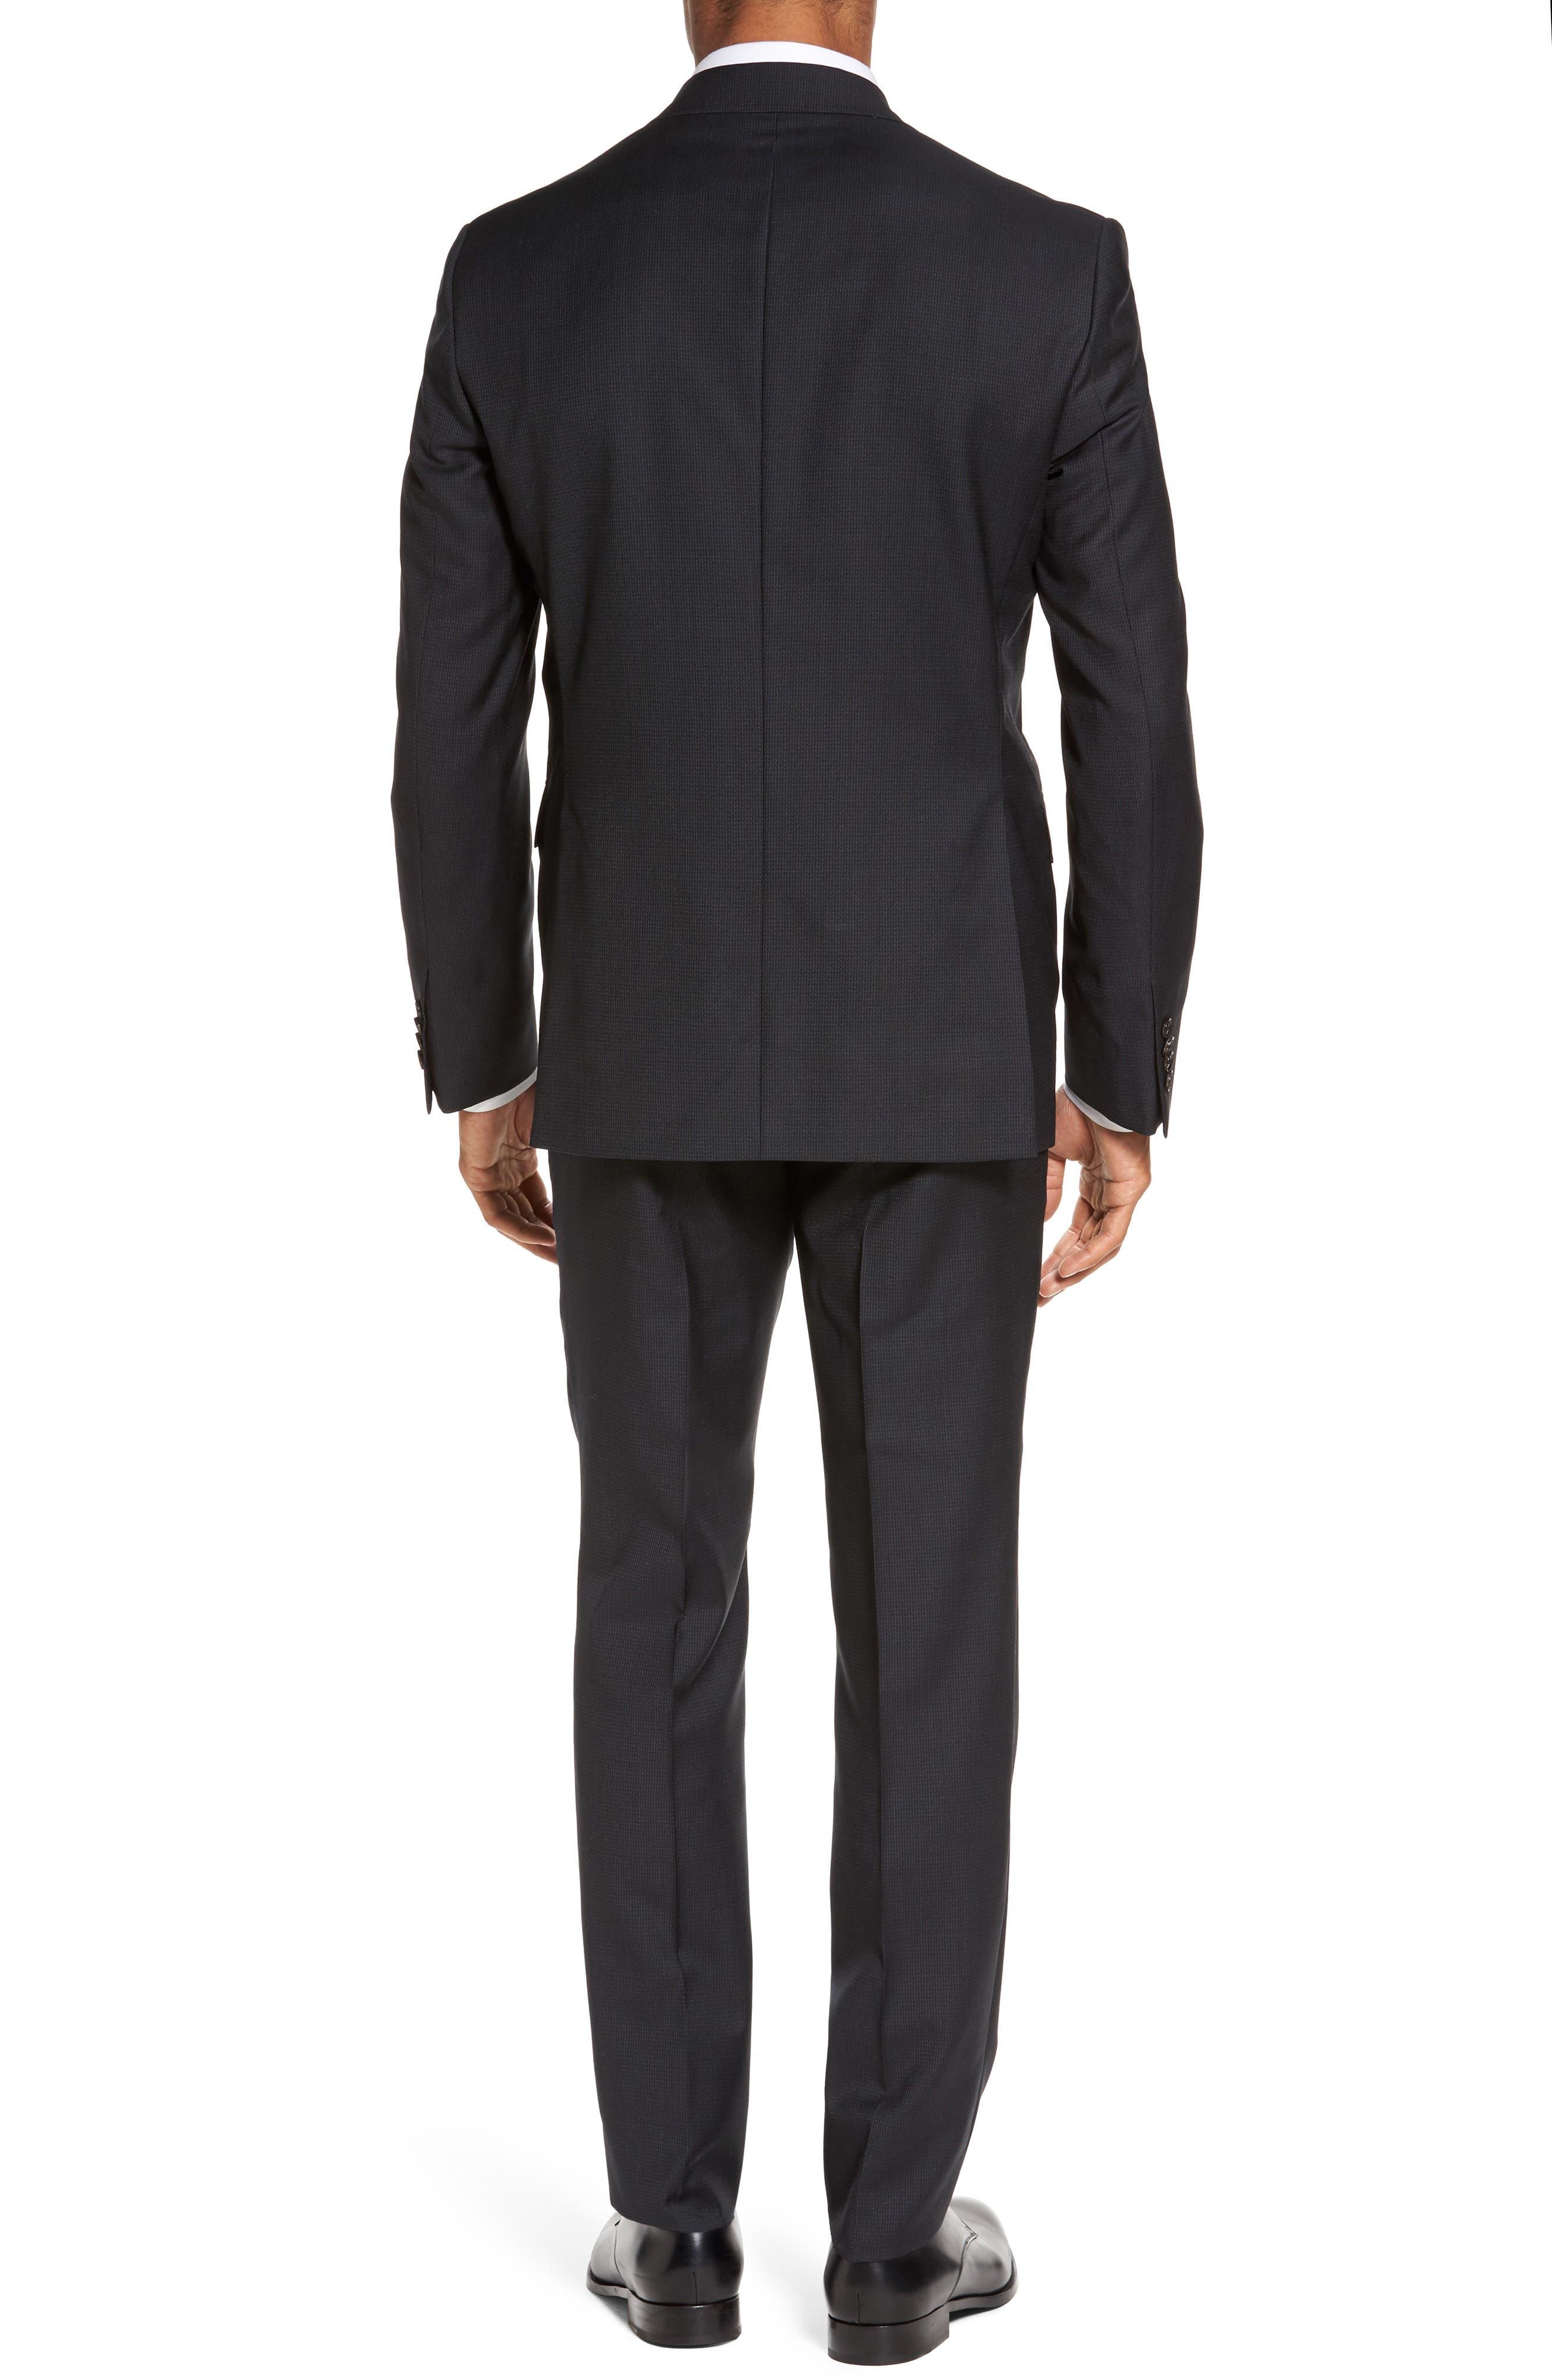 Roger Trim Fit Solid Wool Suit,                             Alternate thumbnail 2, color,                             001